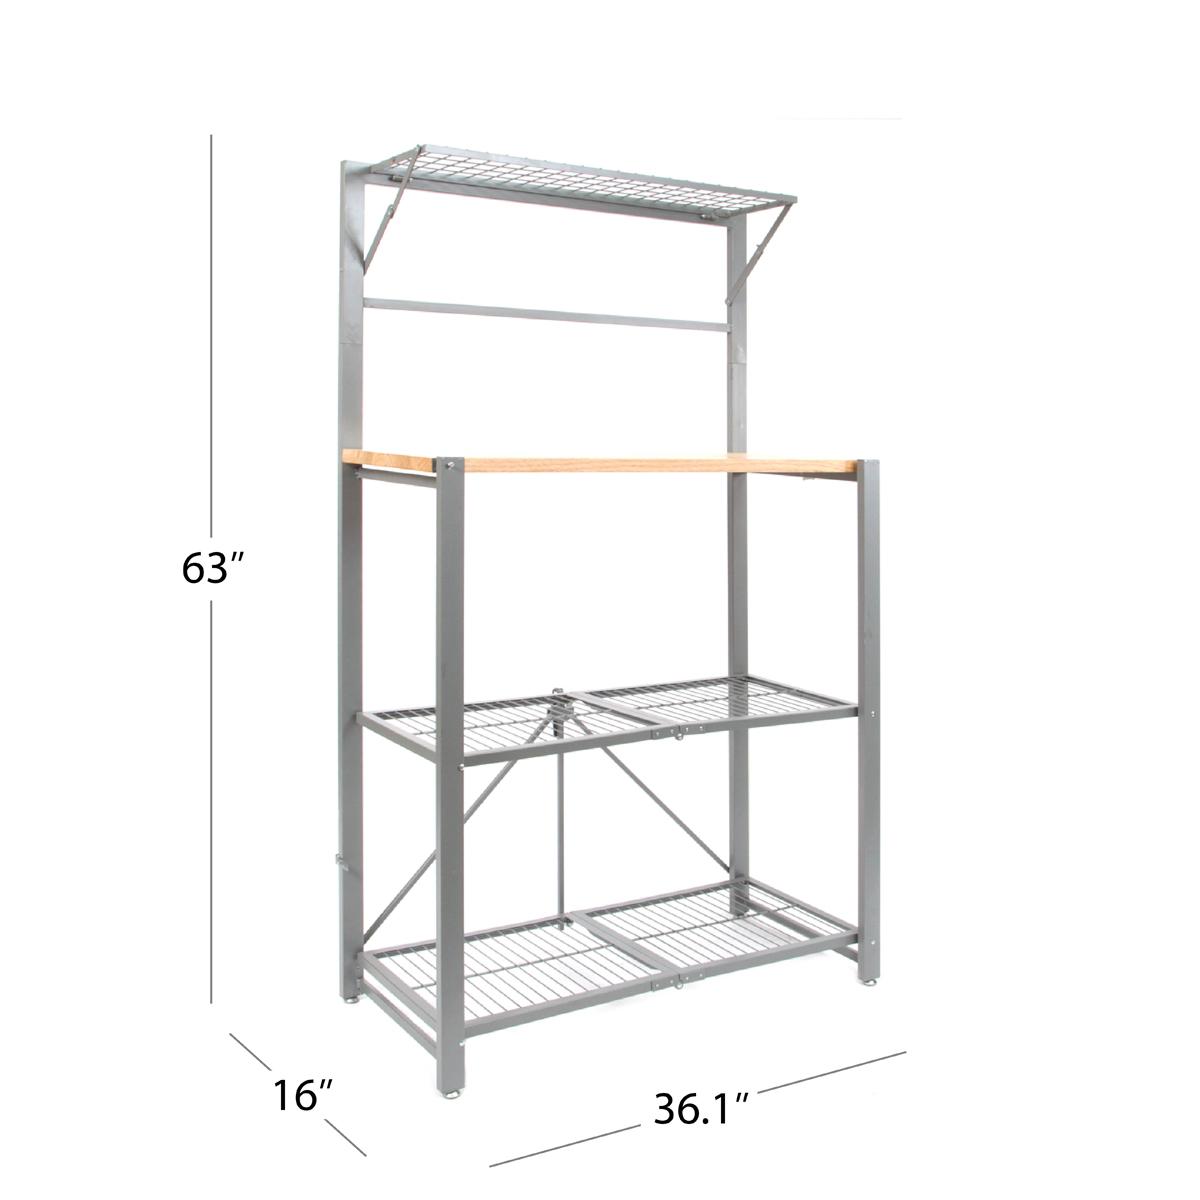 Dimensions & Technical Specs